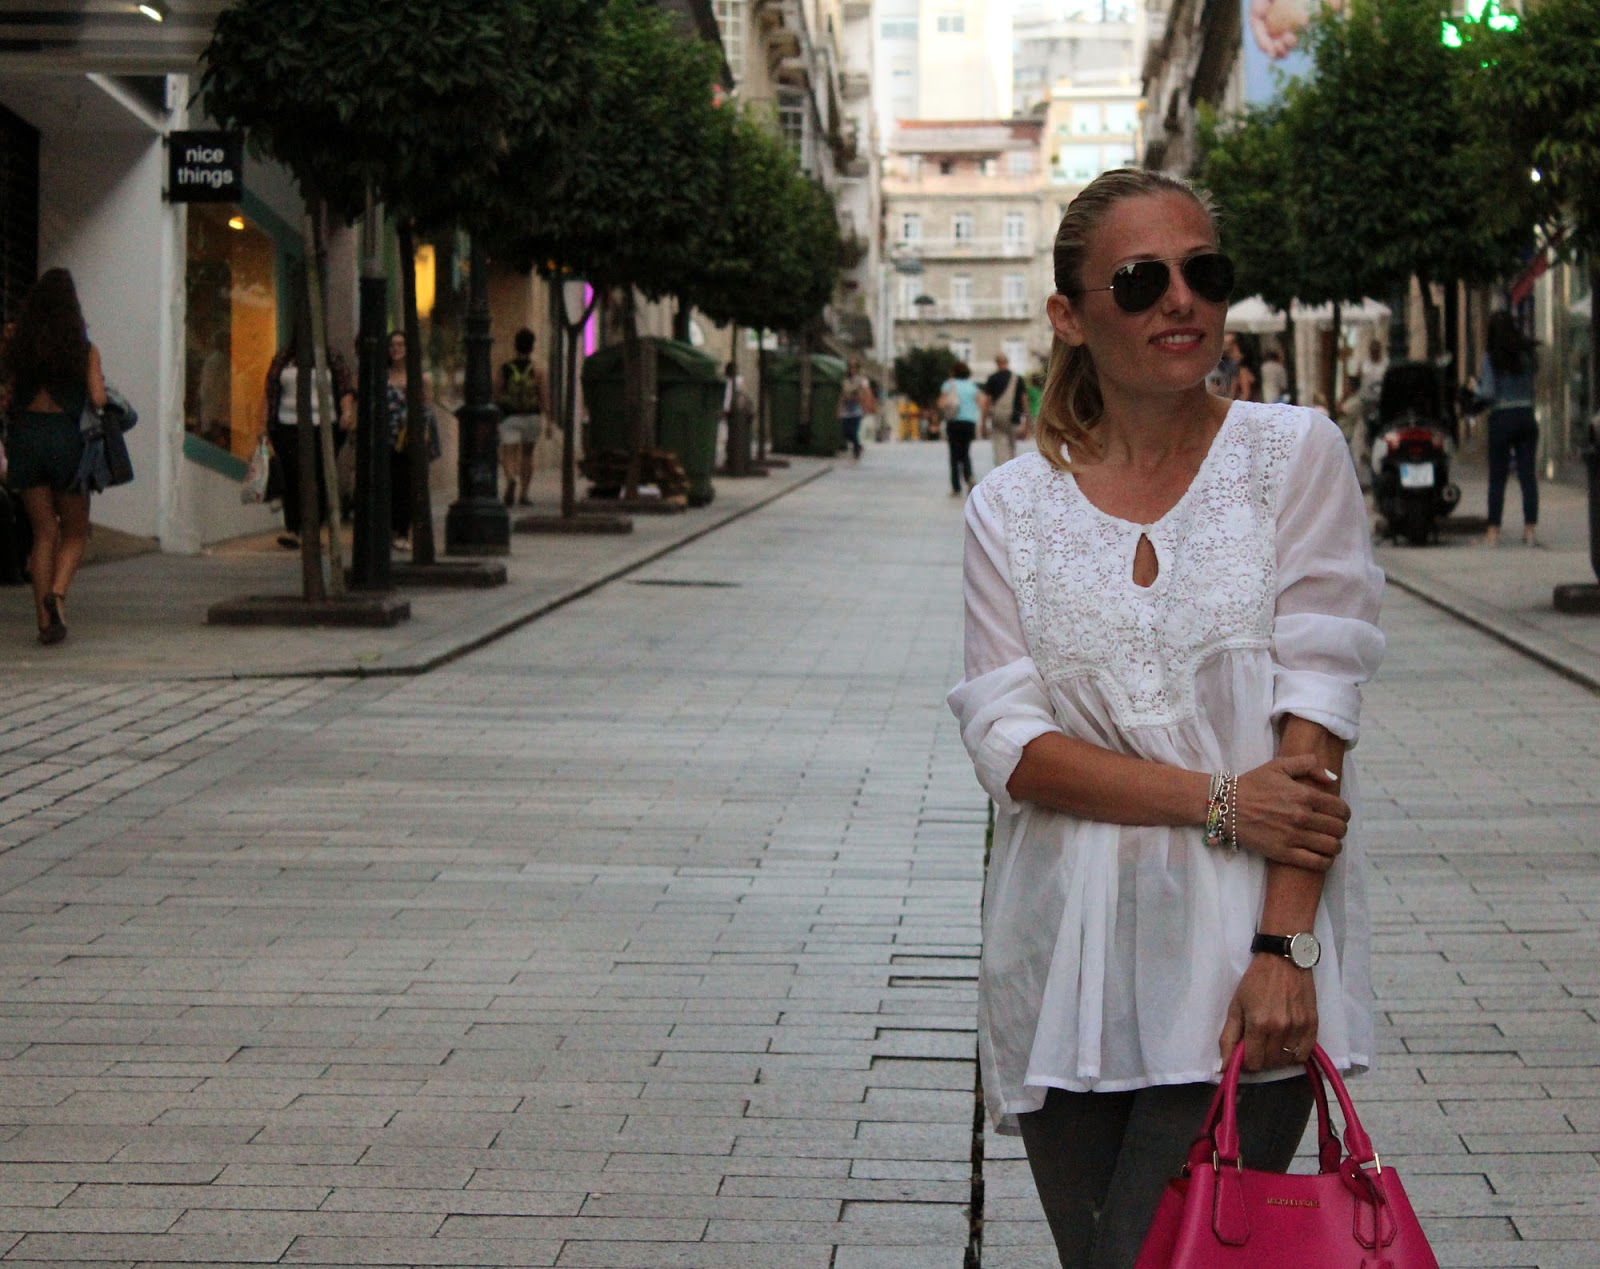 Eniwhere Fashion - Zara Denim & shirt from Vigo